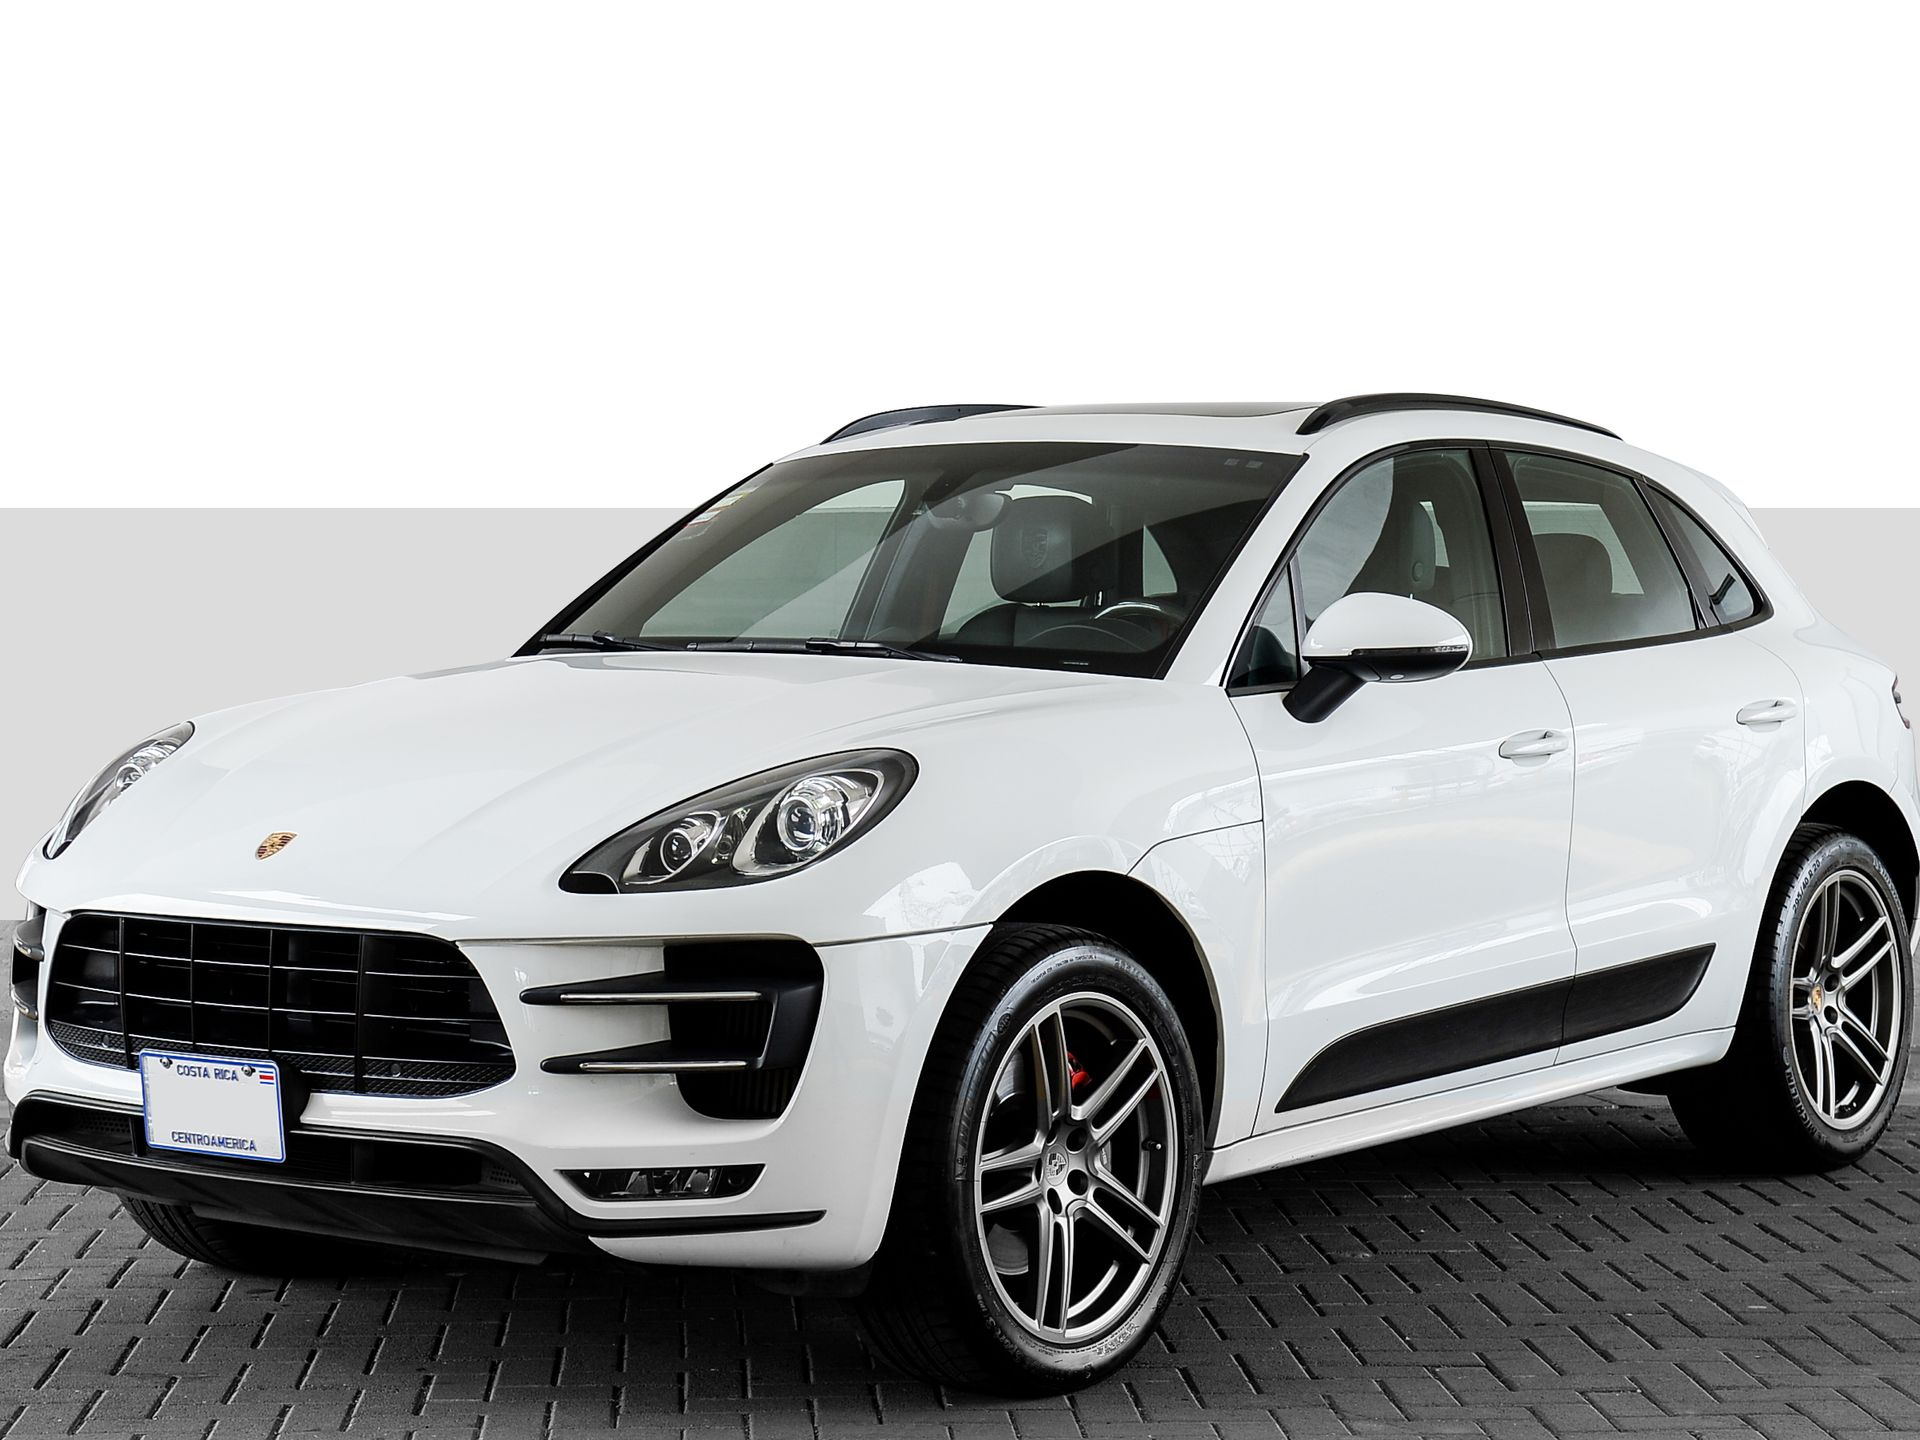 2015 Porsche Macan Turbo – 1